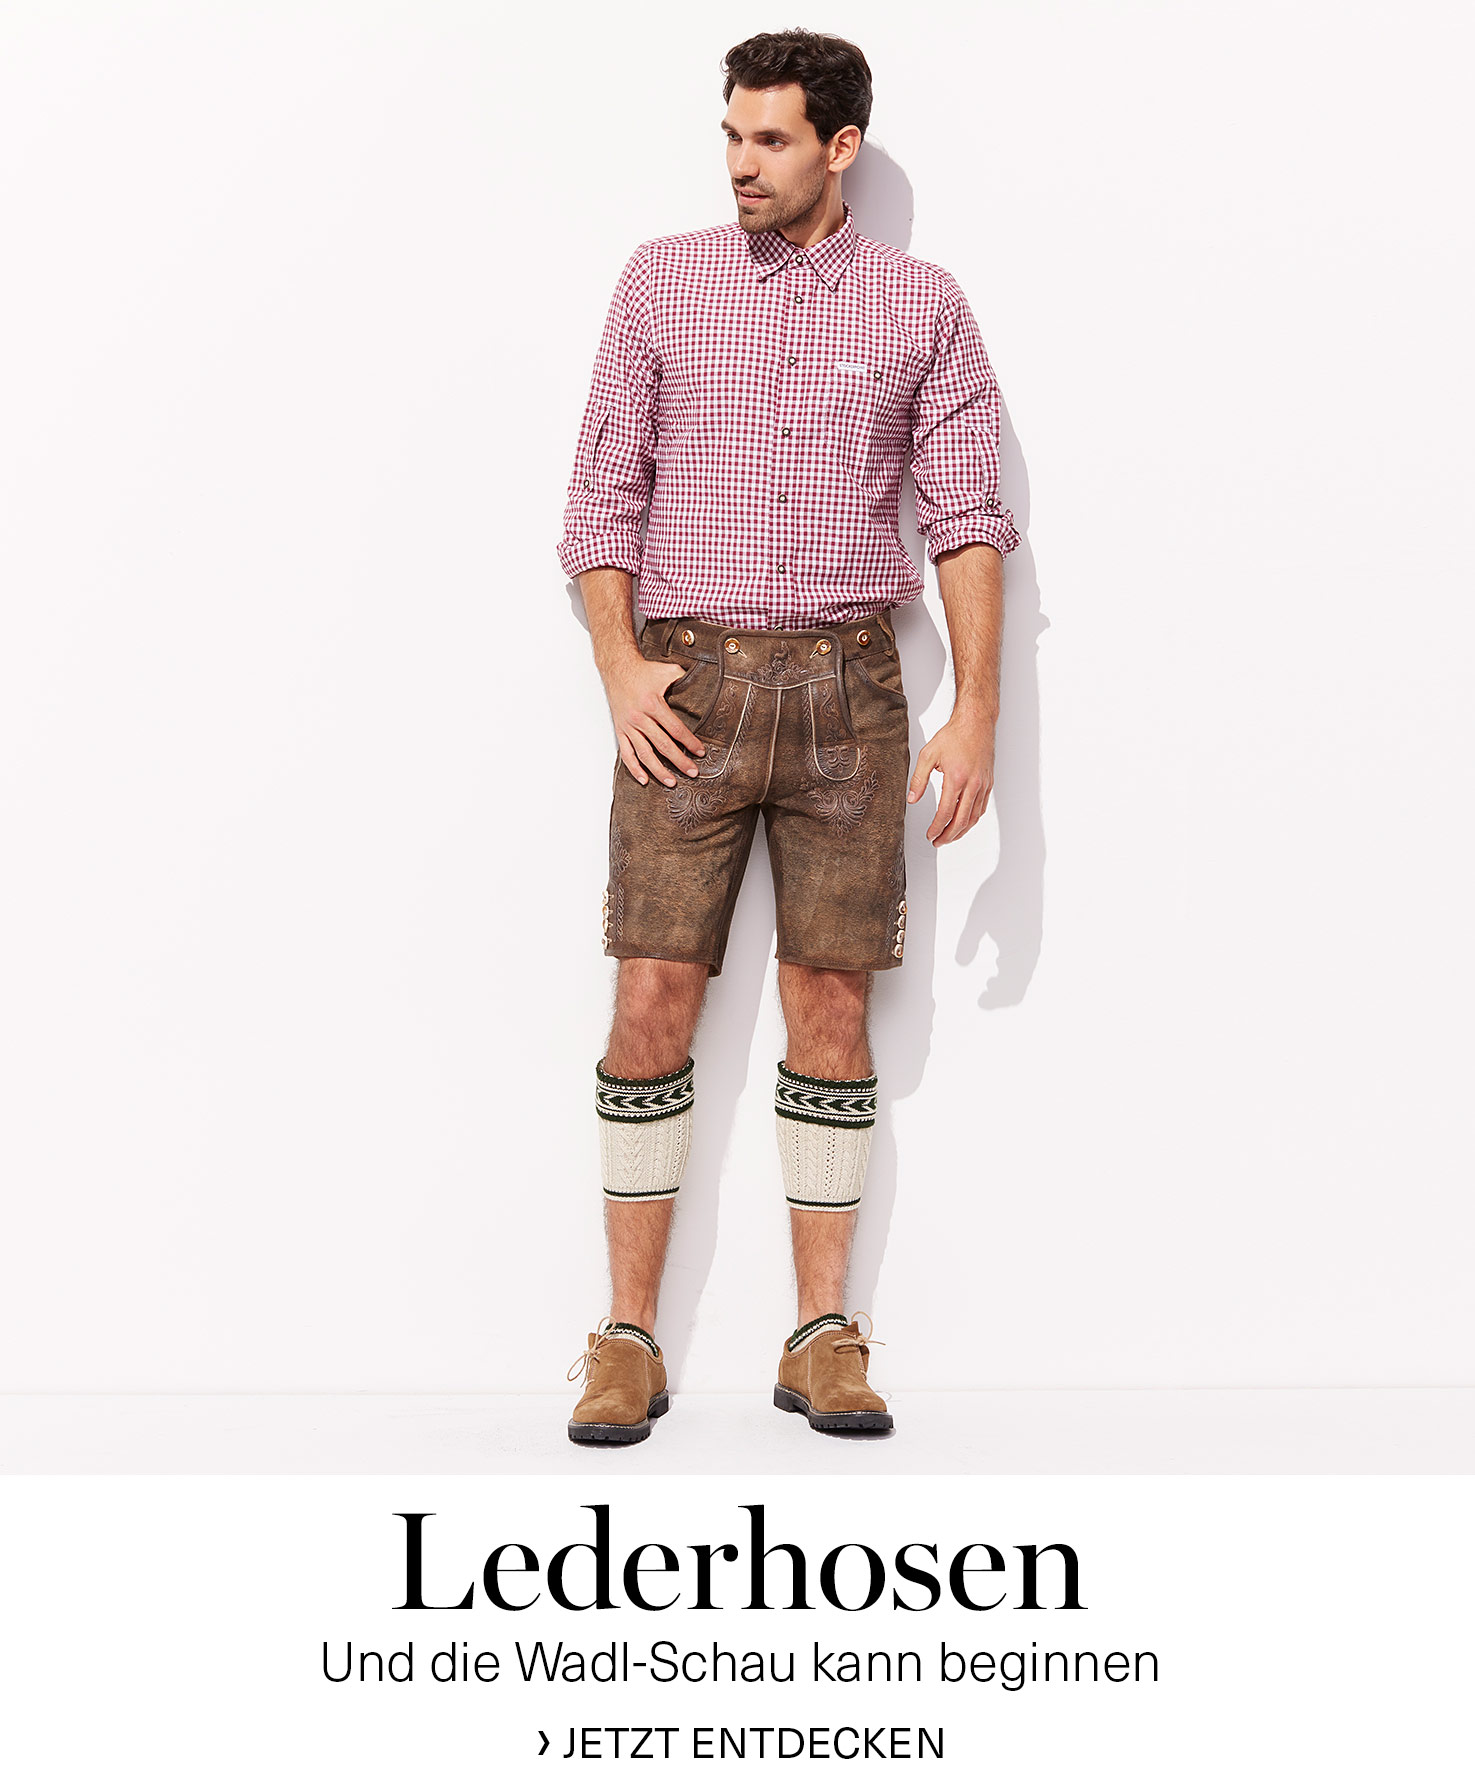 Herren Trachten Bekleidung Lederhosen Trachtenhemden